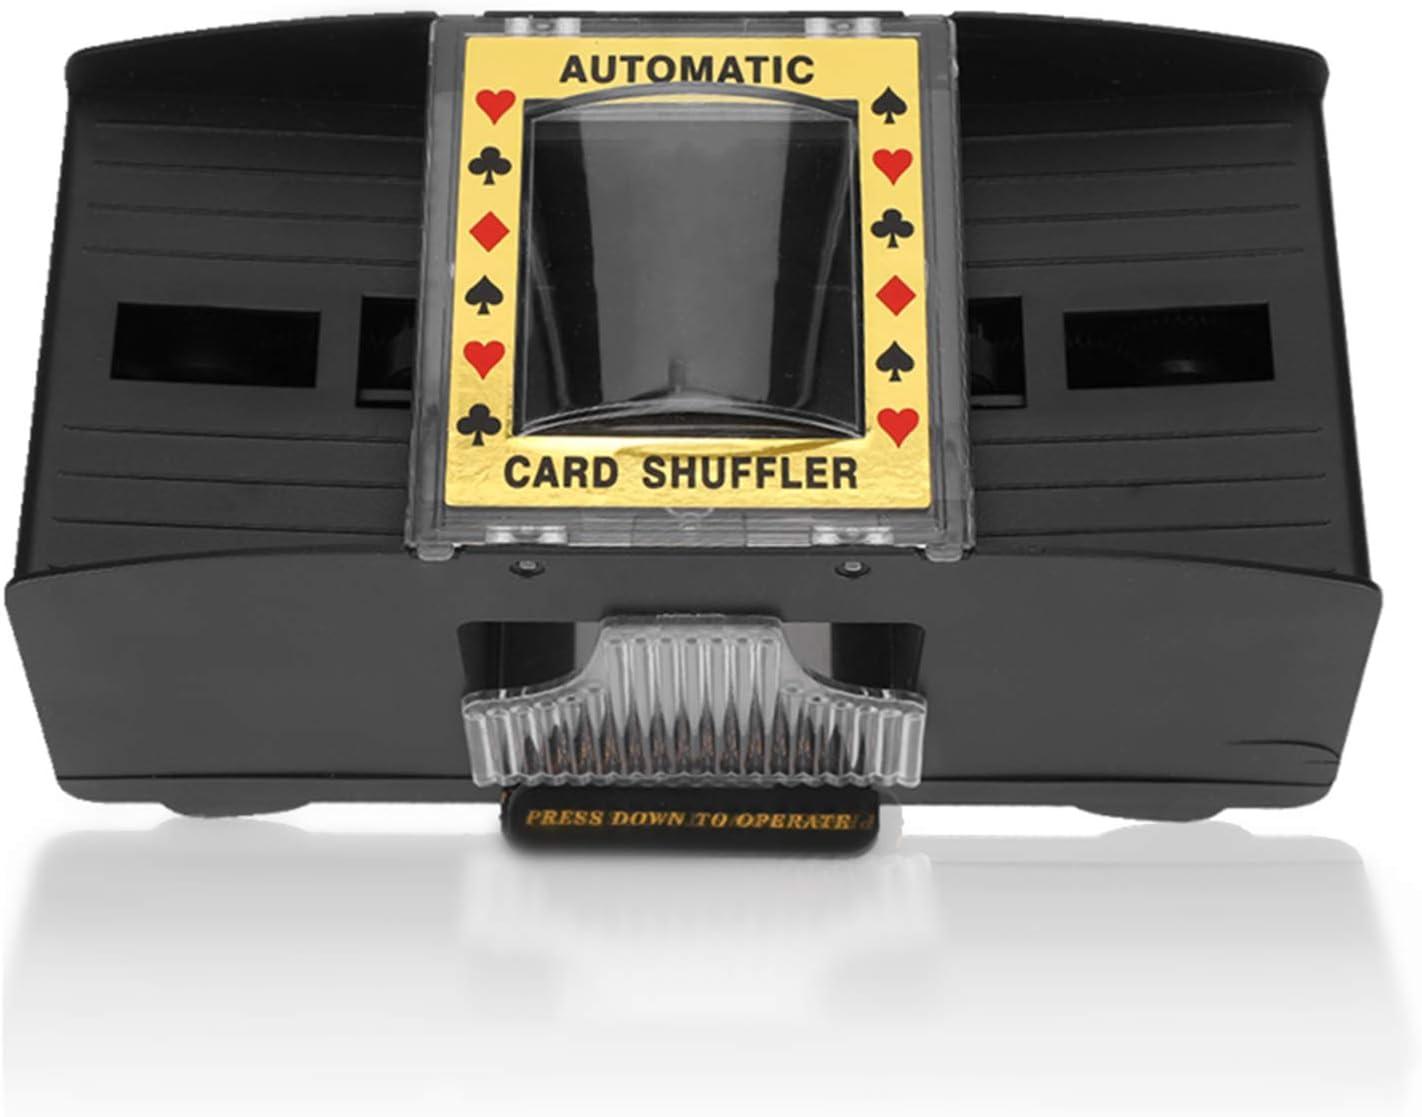 Used casino shuffler class ii slot machines